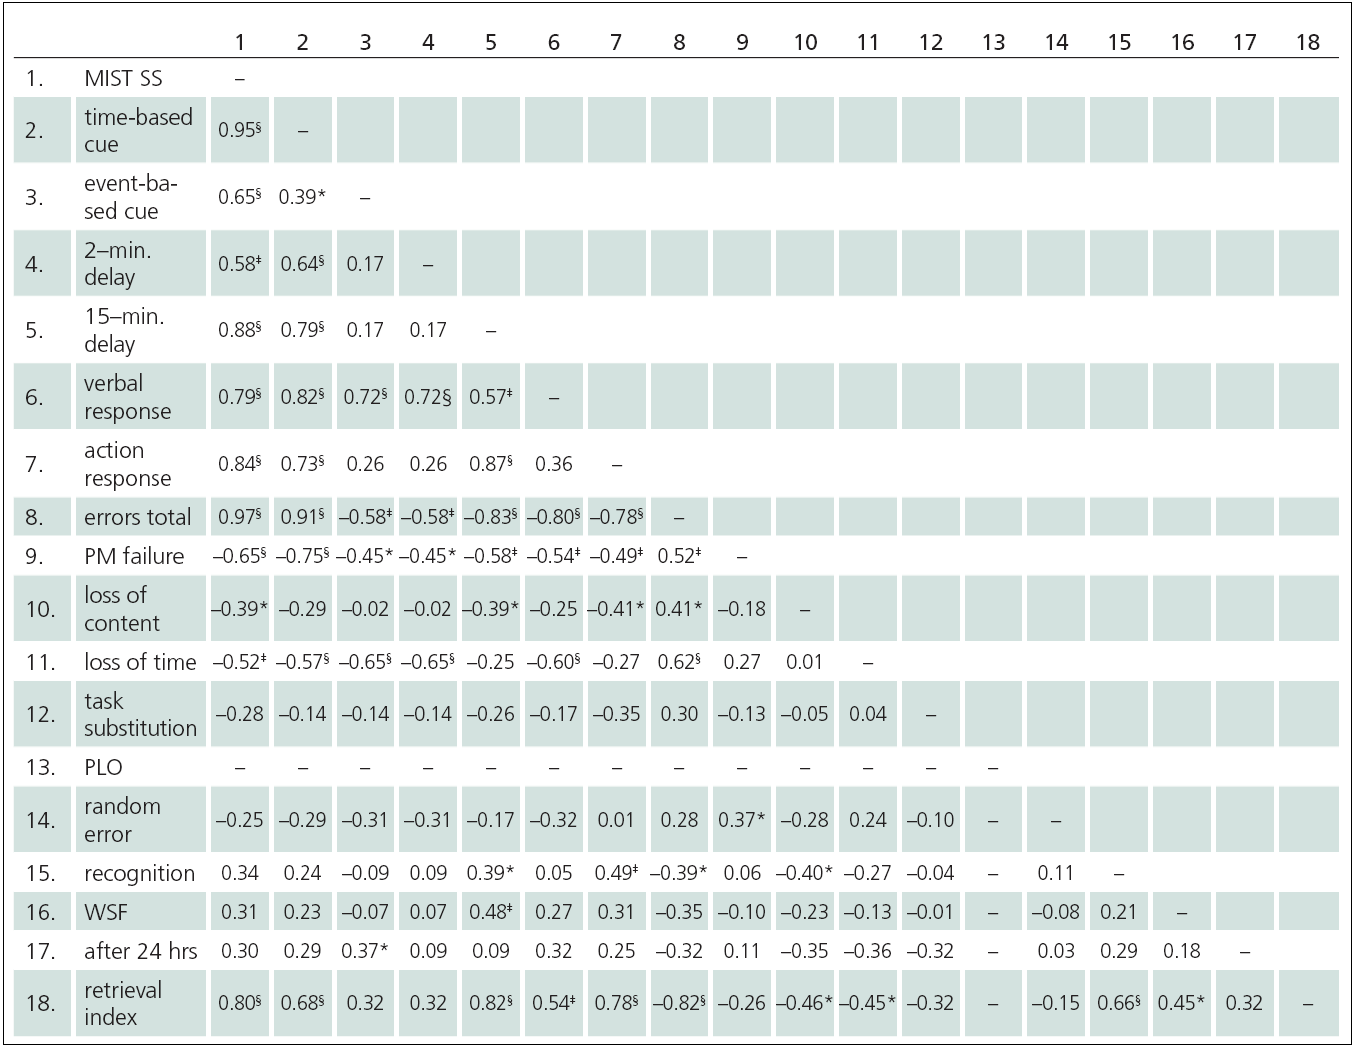 Correlation (rho) between MIST Summary score, subscales and error scores (n = 30).